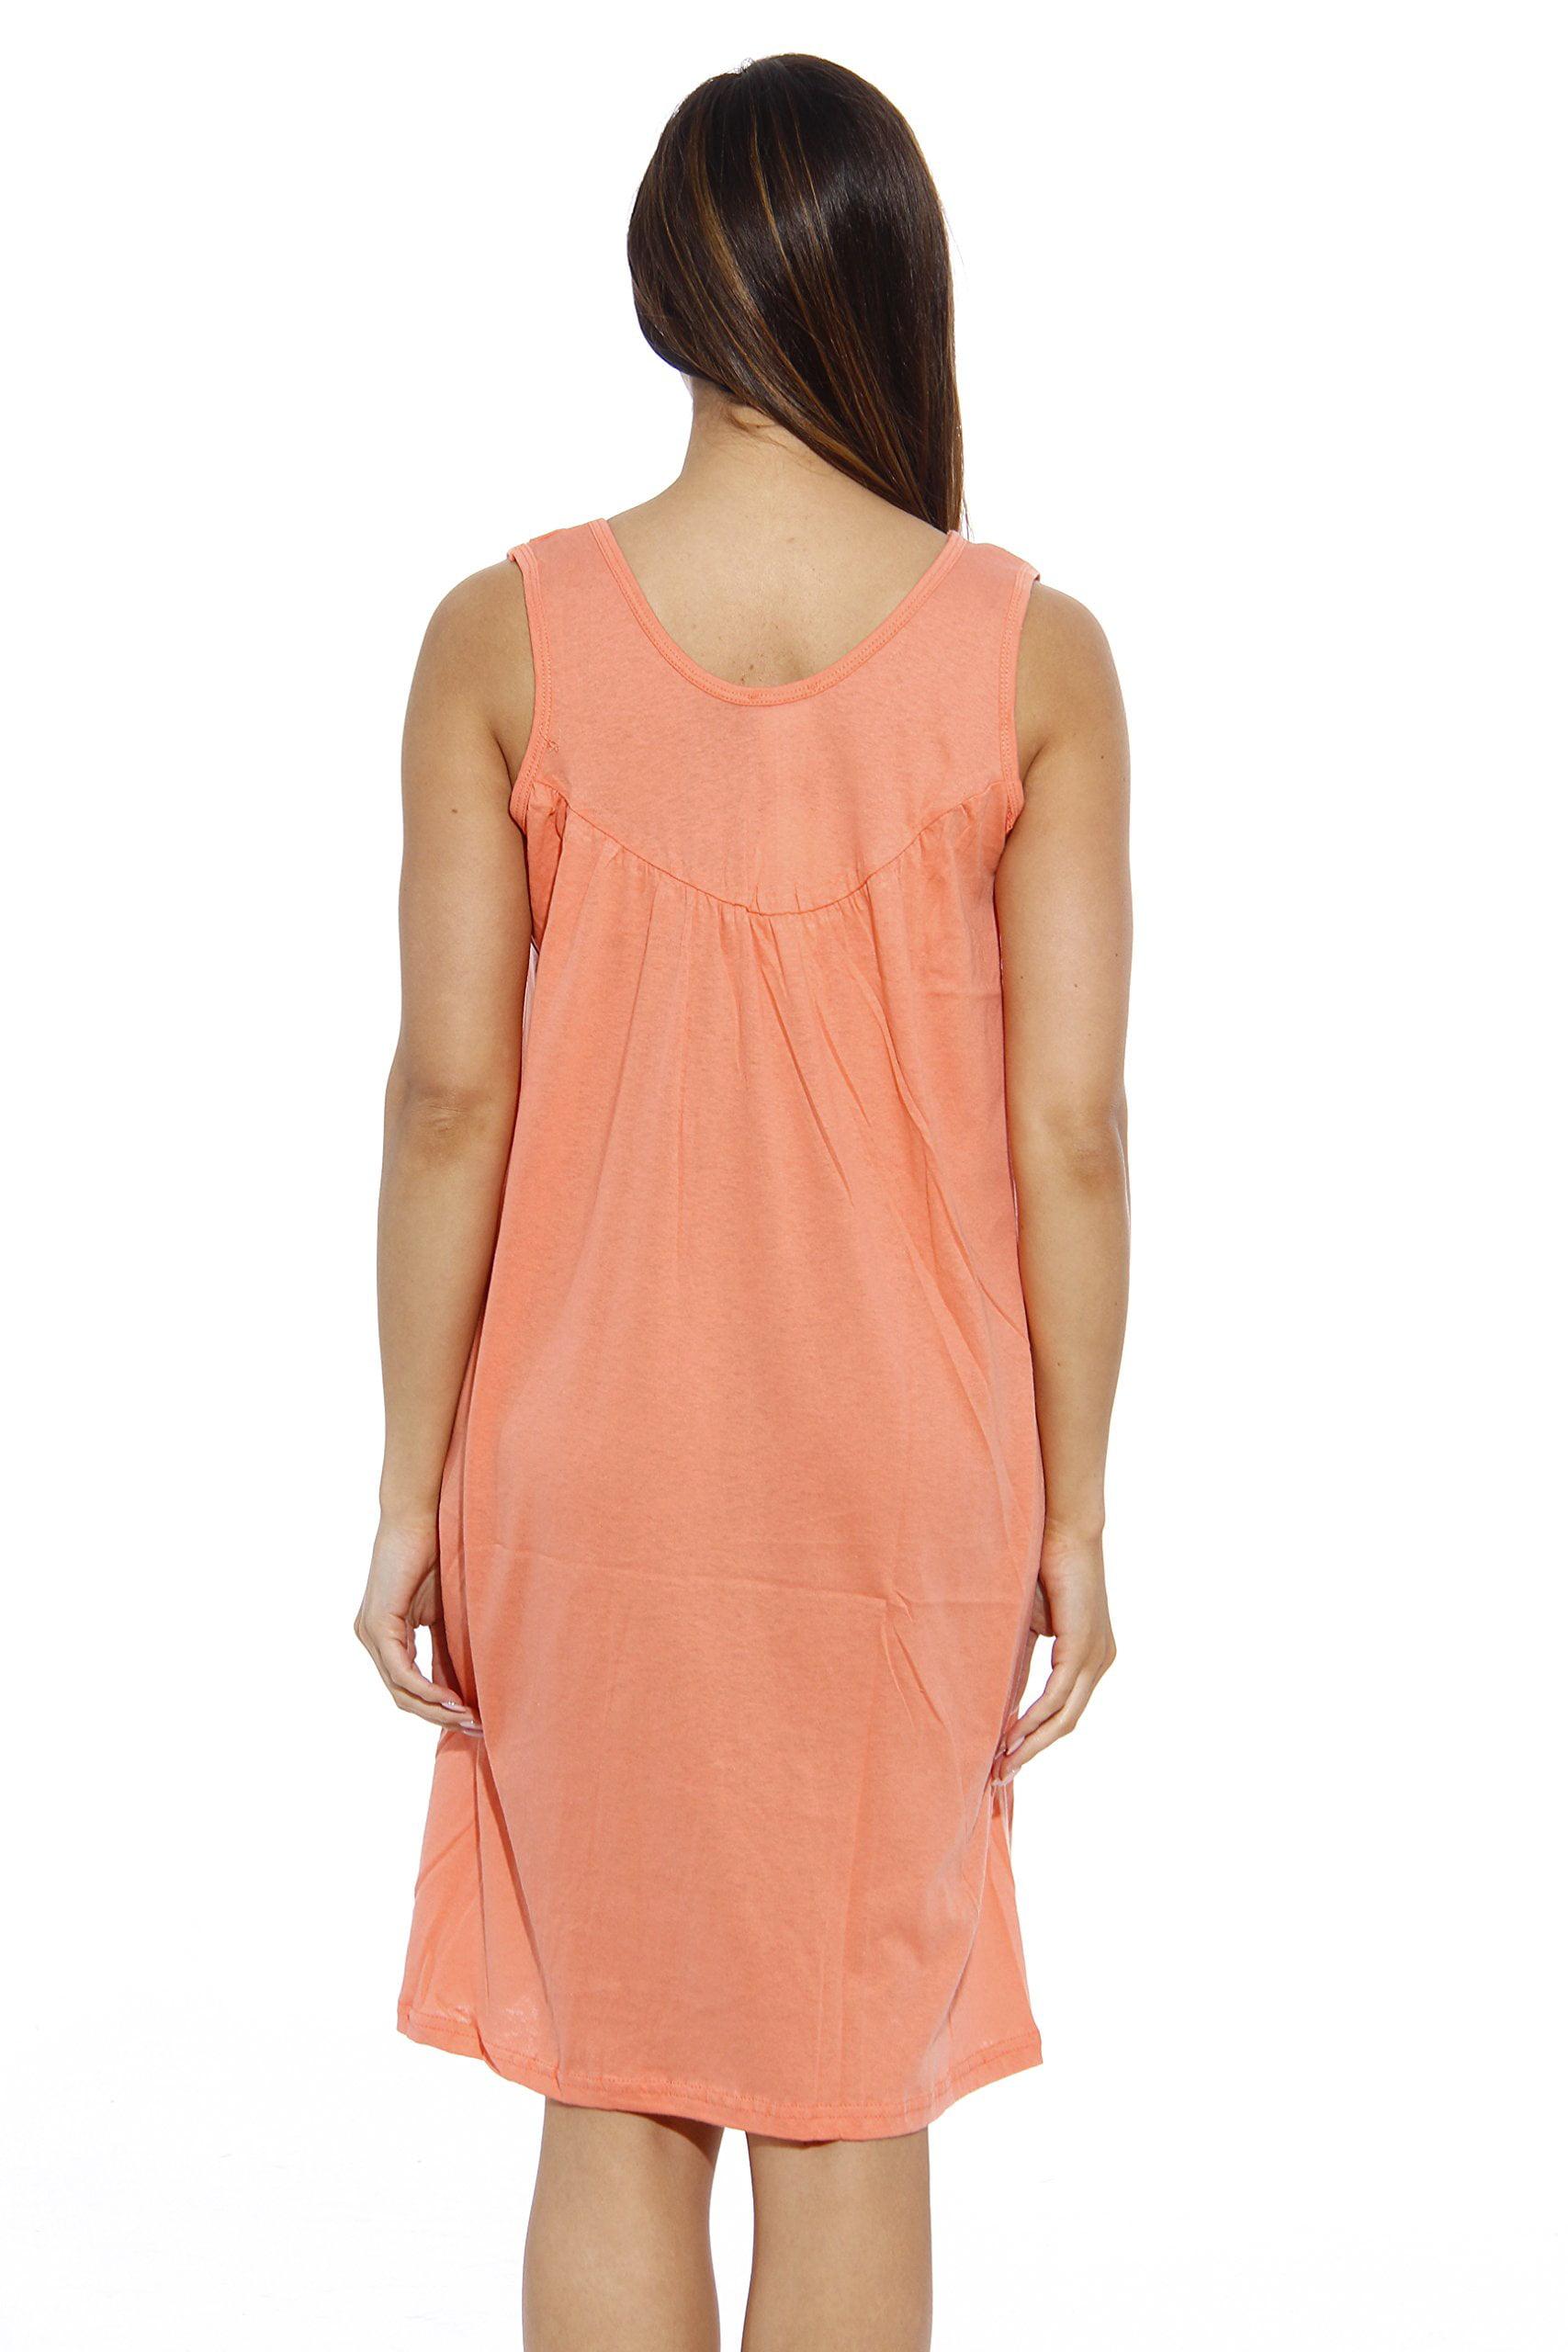 09e70c9718 Dreamcrest Nightgown   Womans Pajamas   Women Sleepwear (Strawberry Scoop  Neck